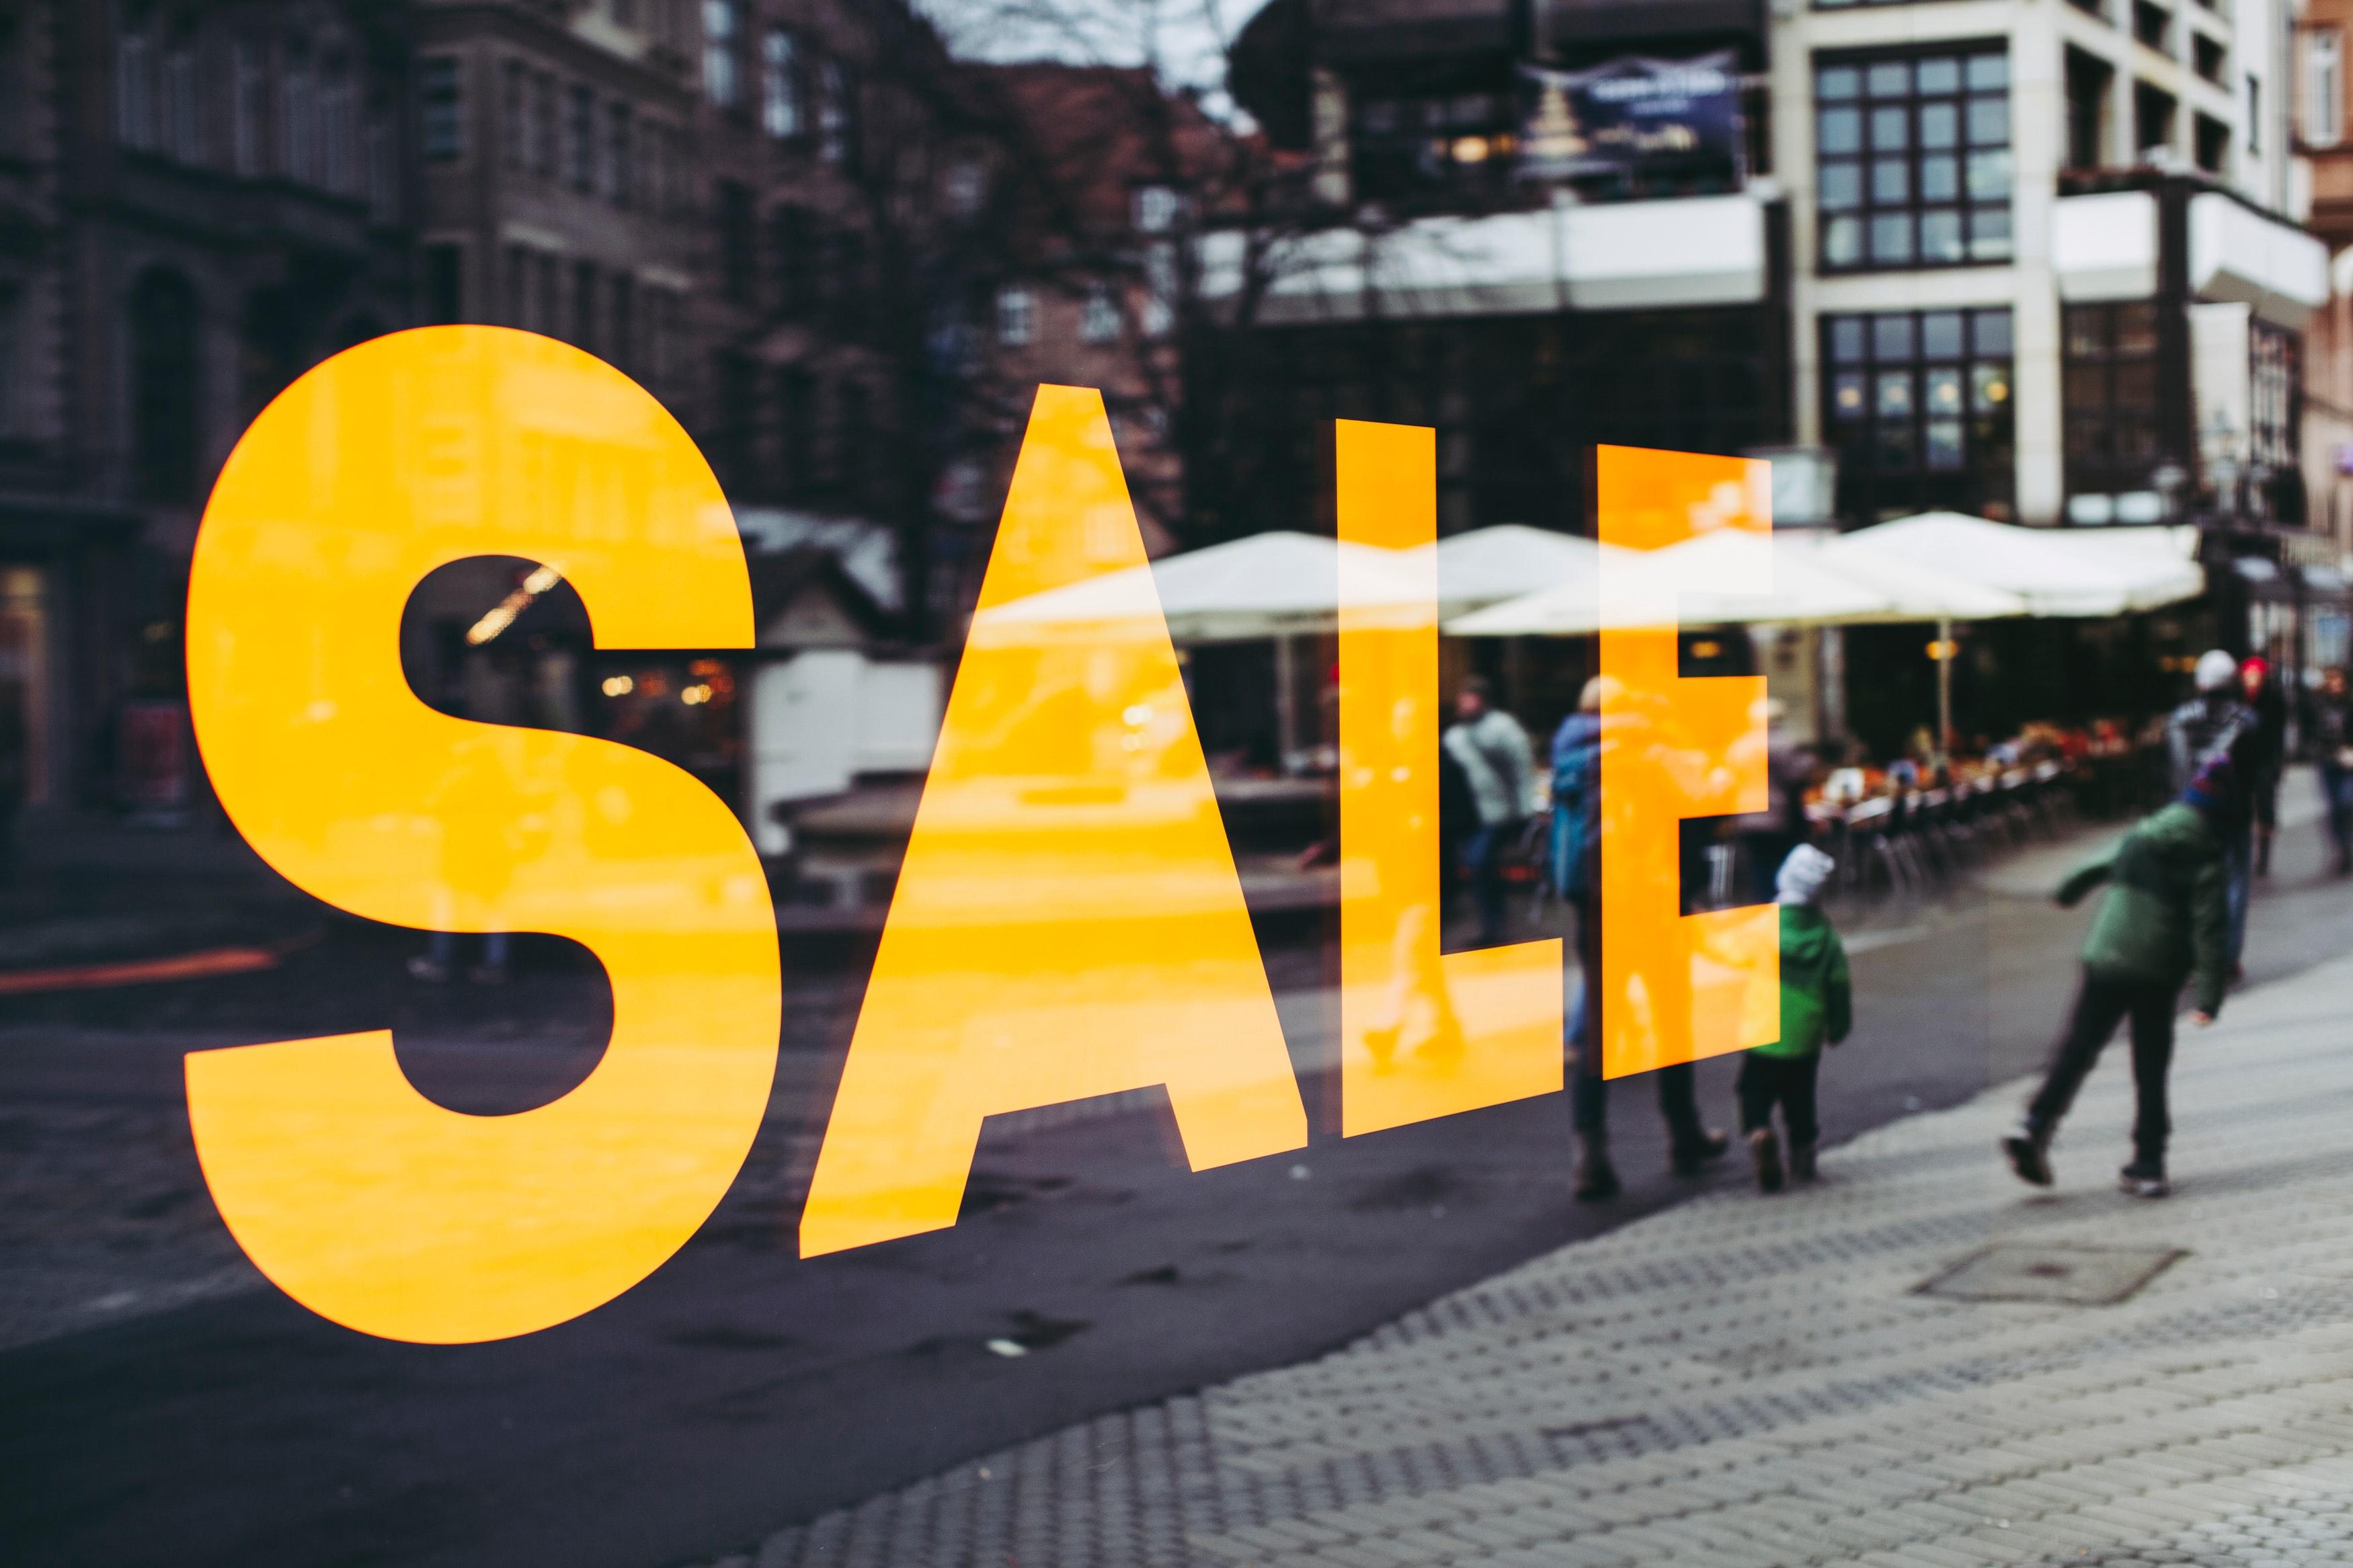 'Sale' advert on high street. Photo by @markusspiske via Unsplash